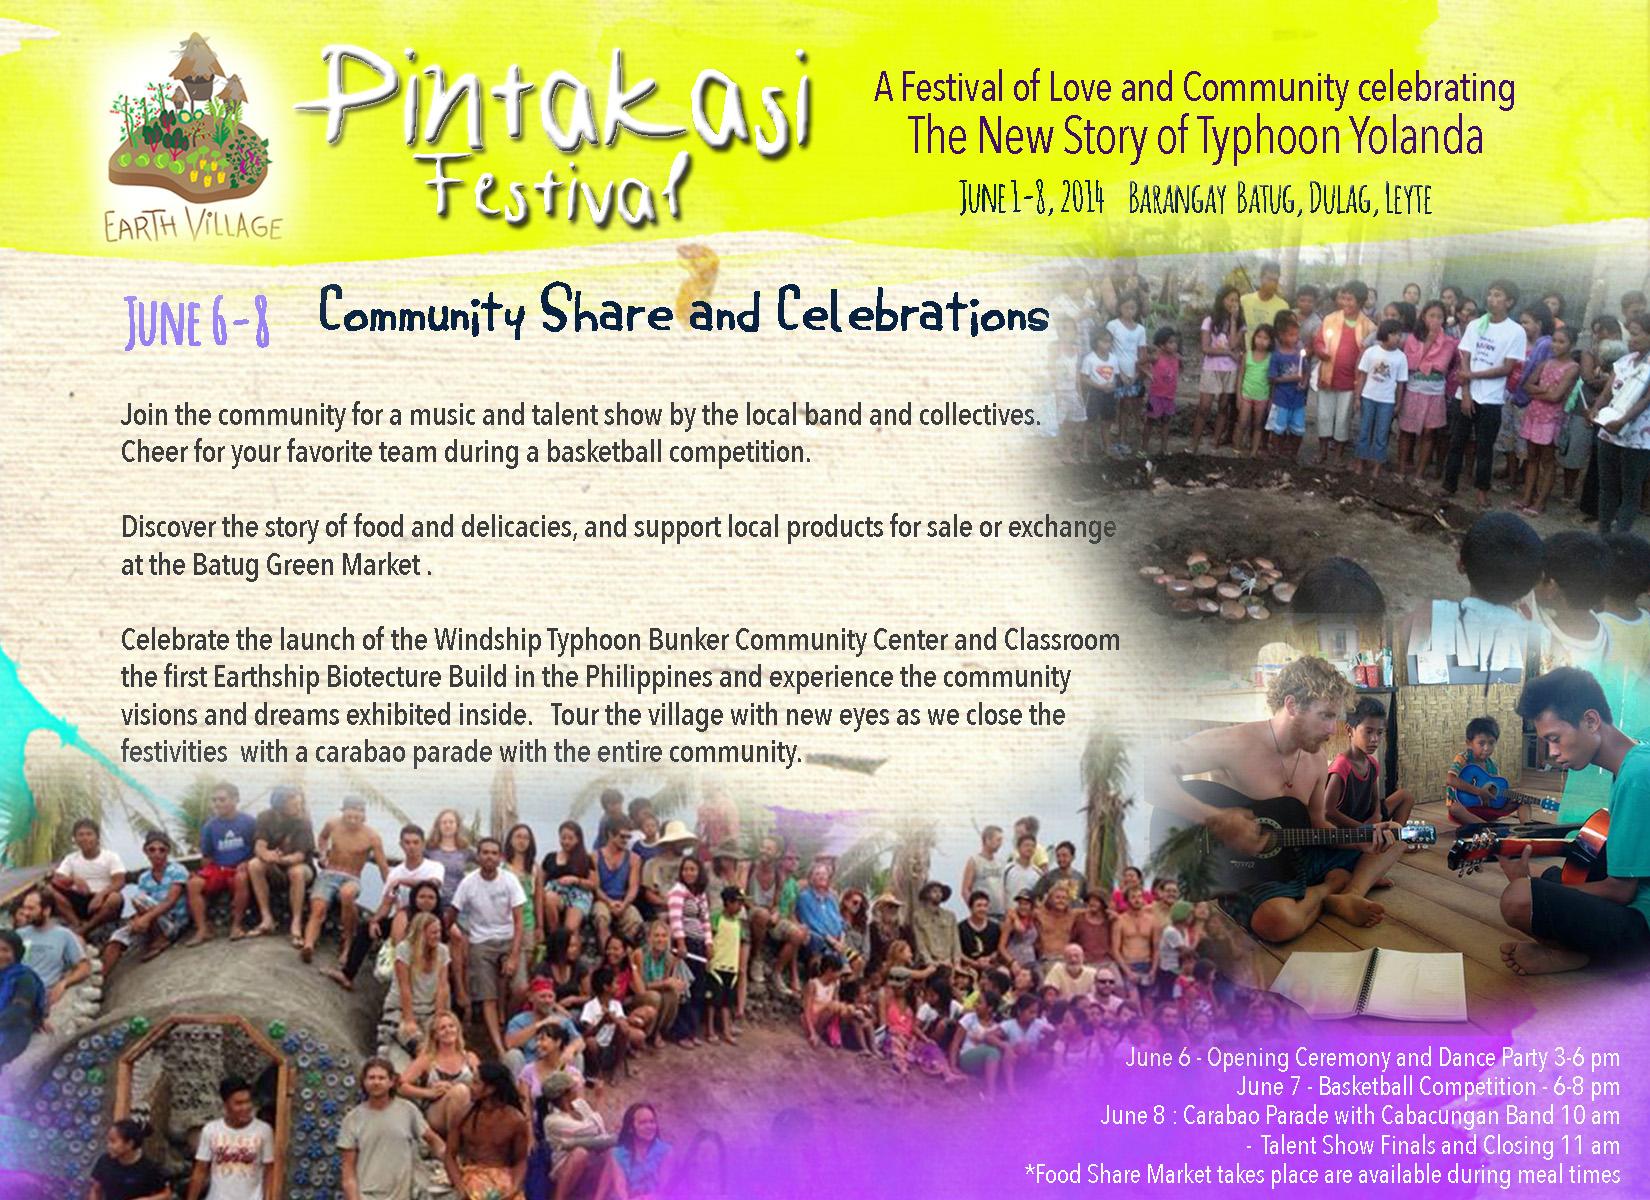 Earth Village Festival06